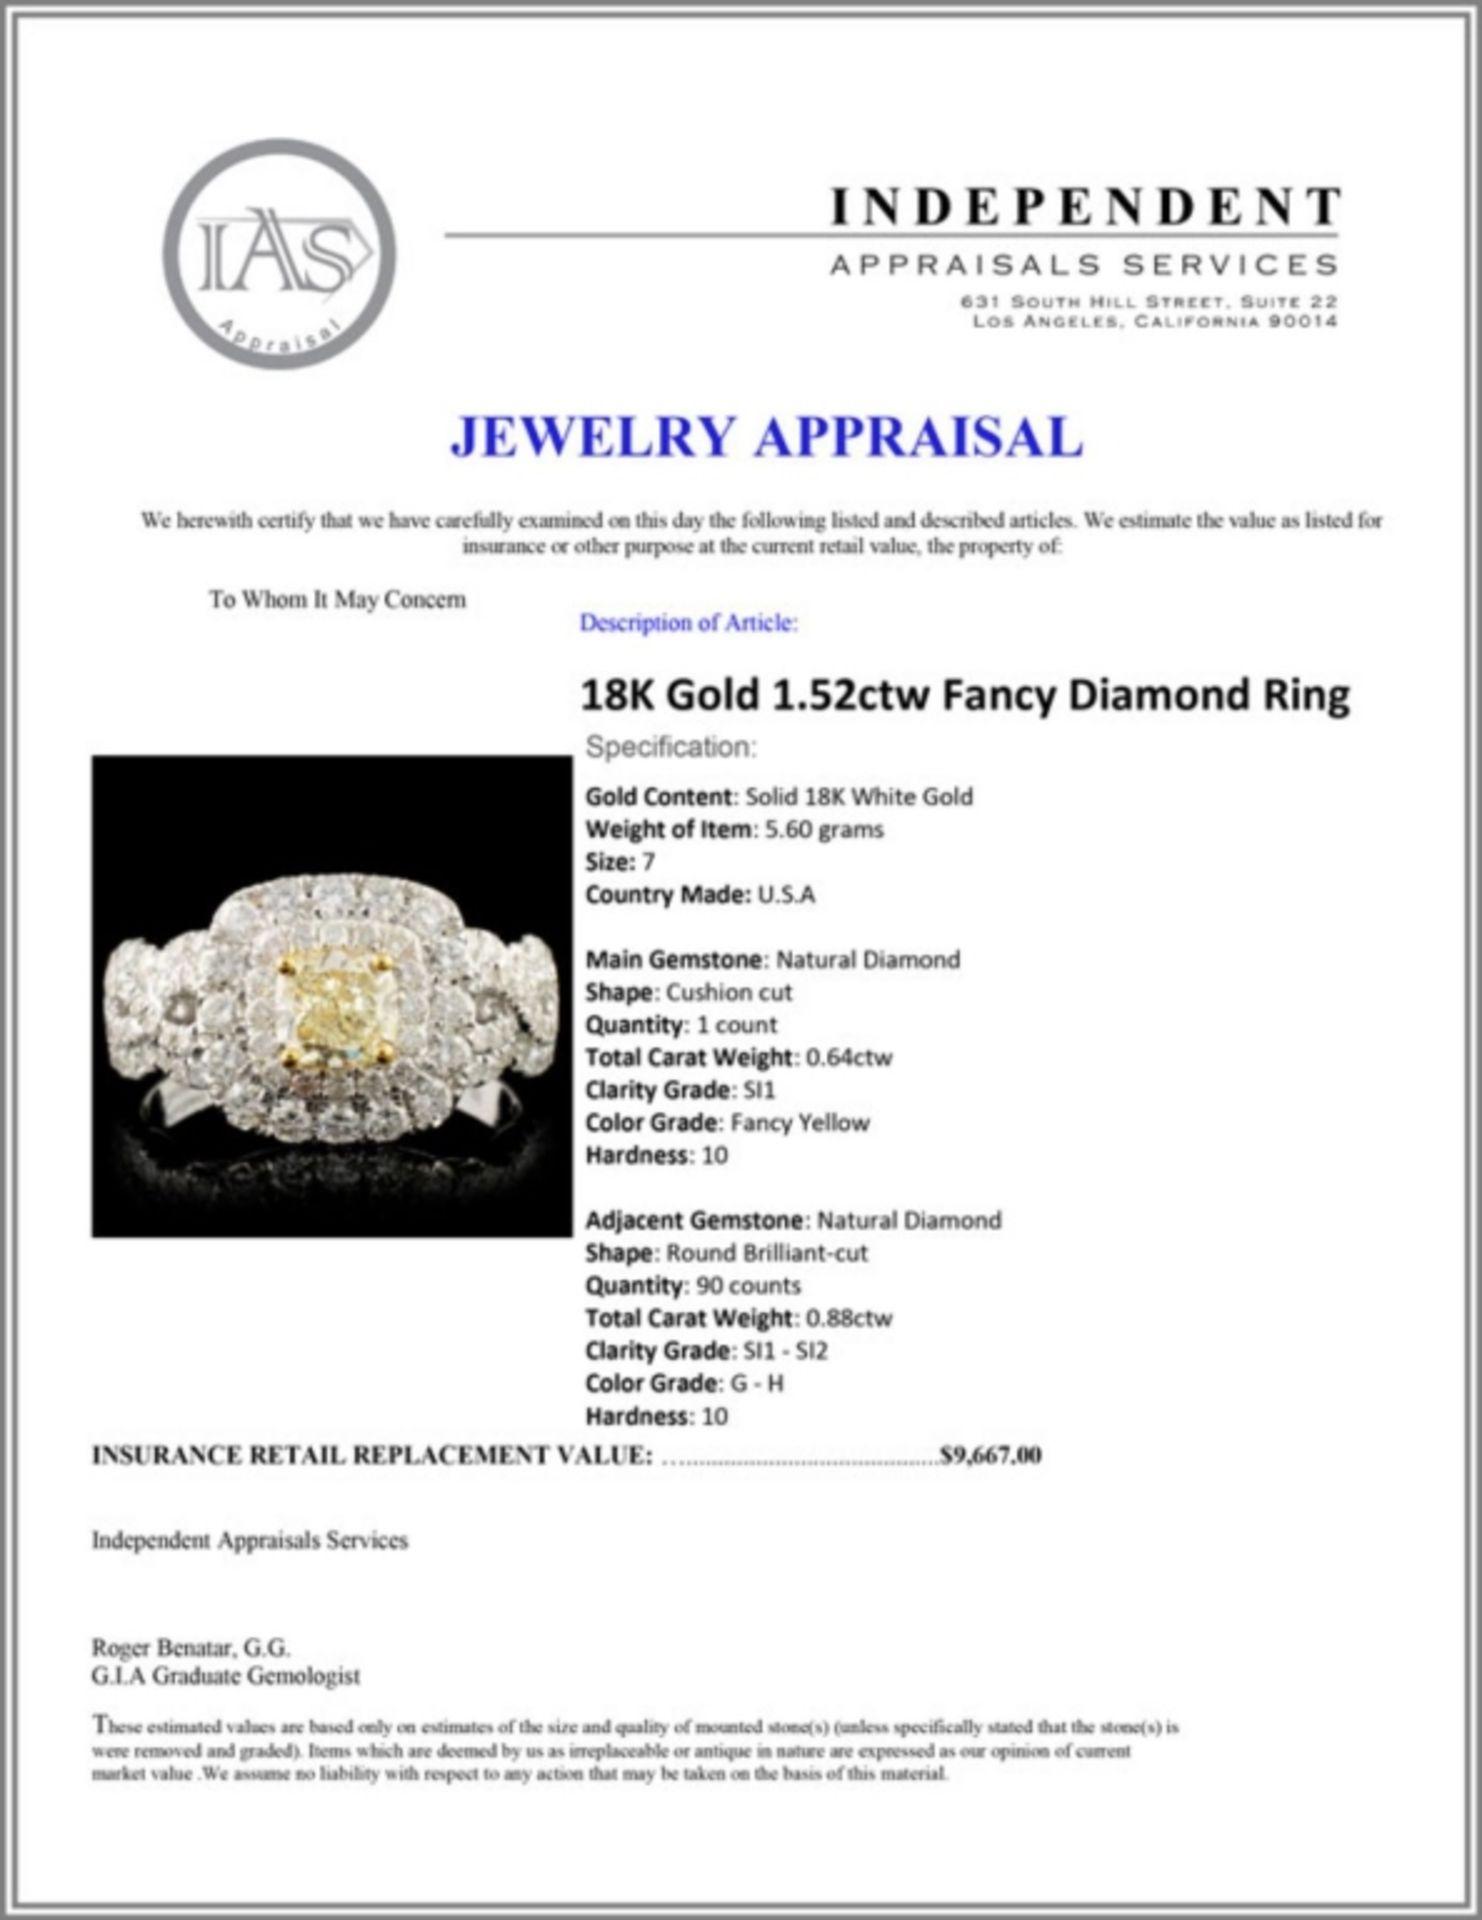 18K Gold 1.52ctw Fancy Diamond Ring - Image 5 of 5